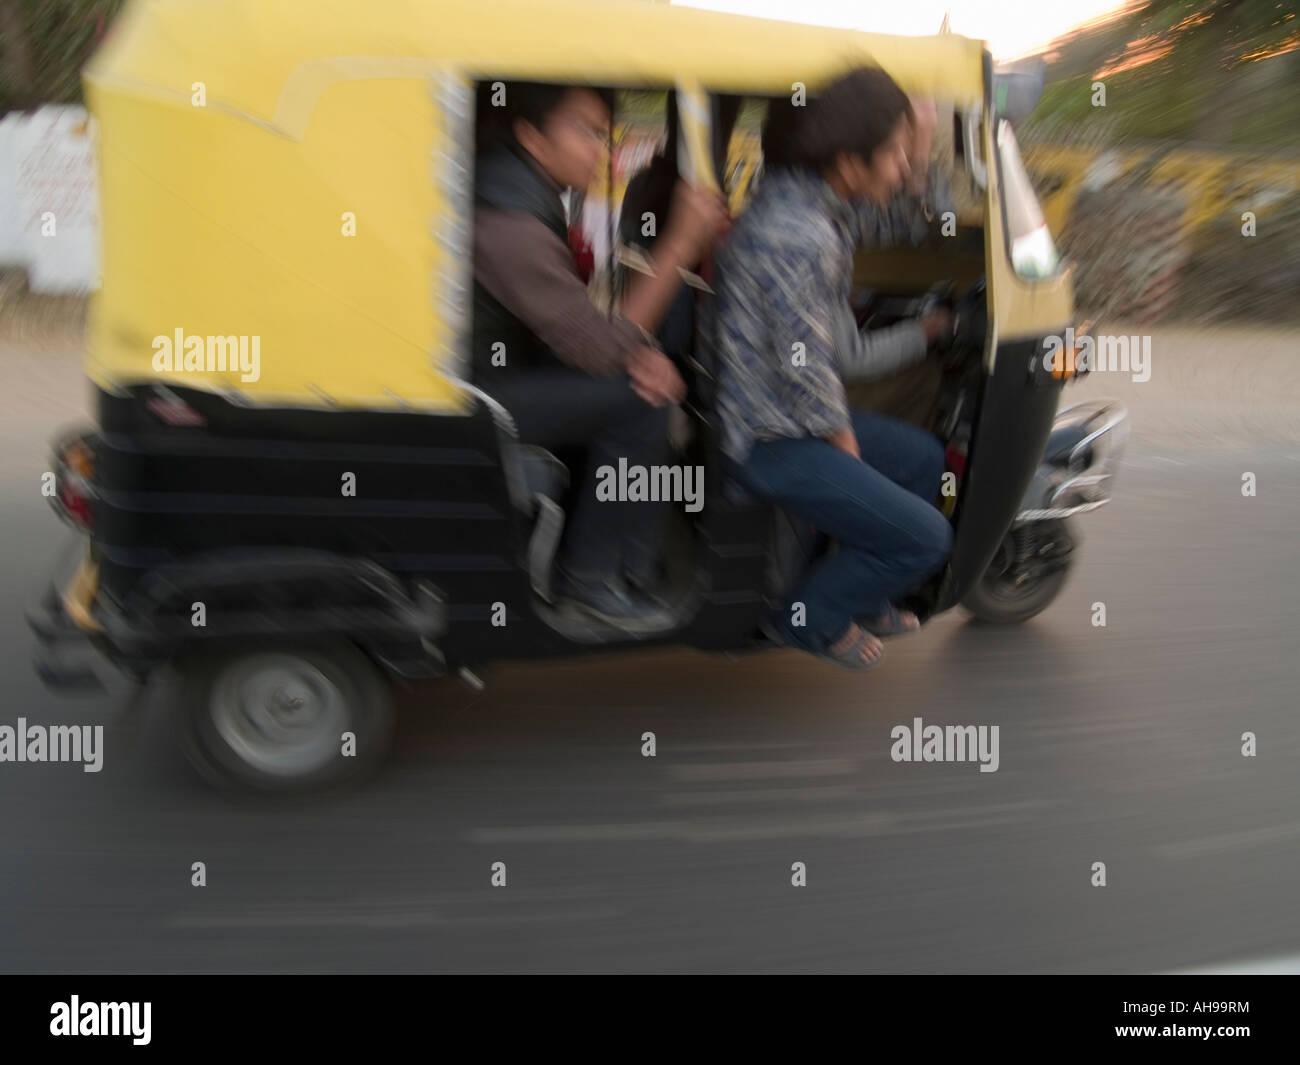 Three wheeled motorized taxi - Stock Image